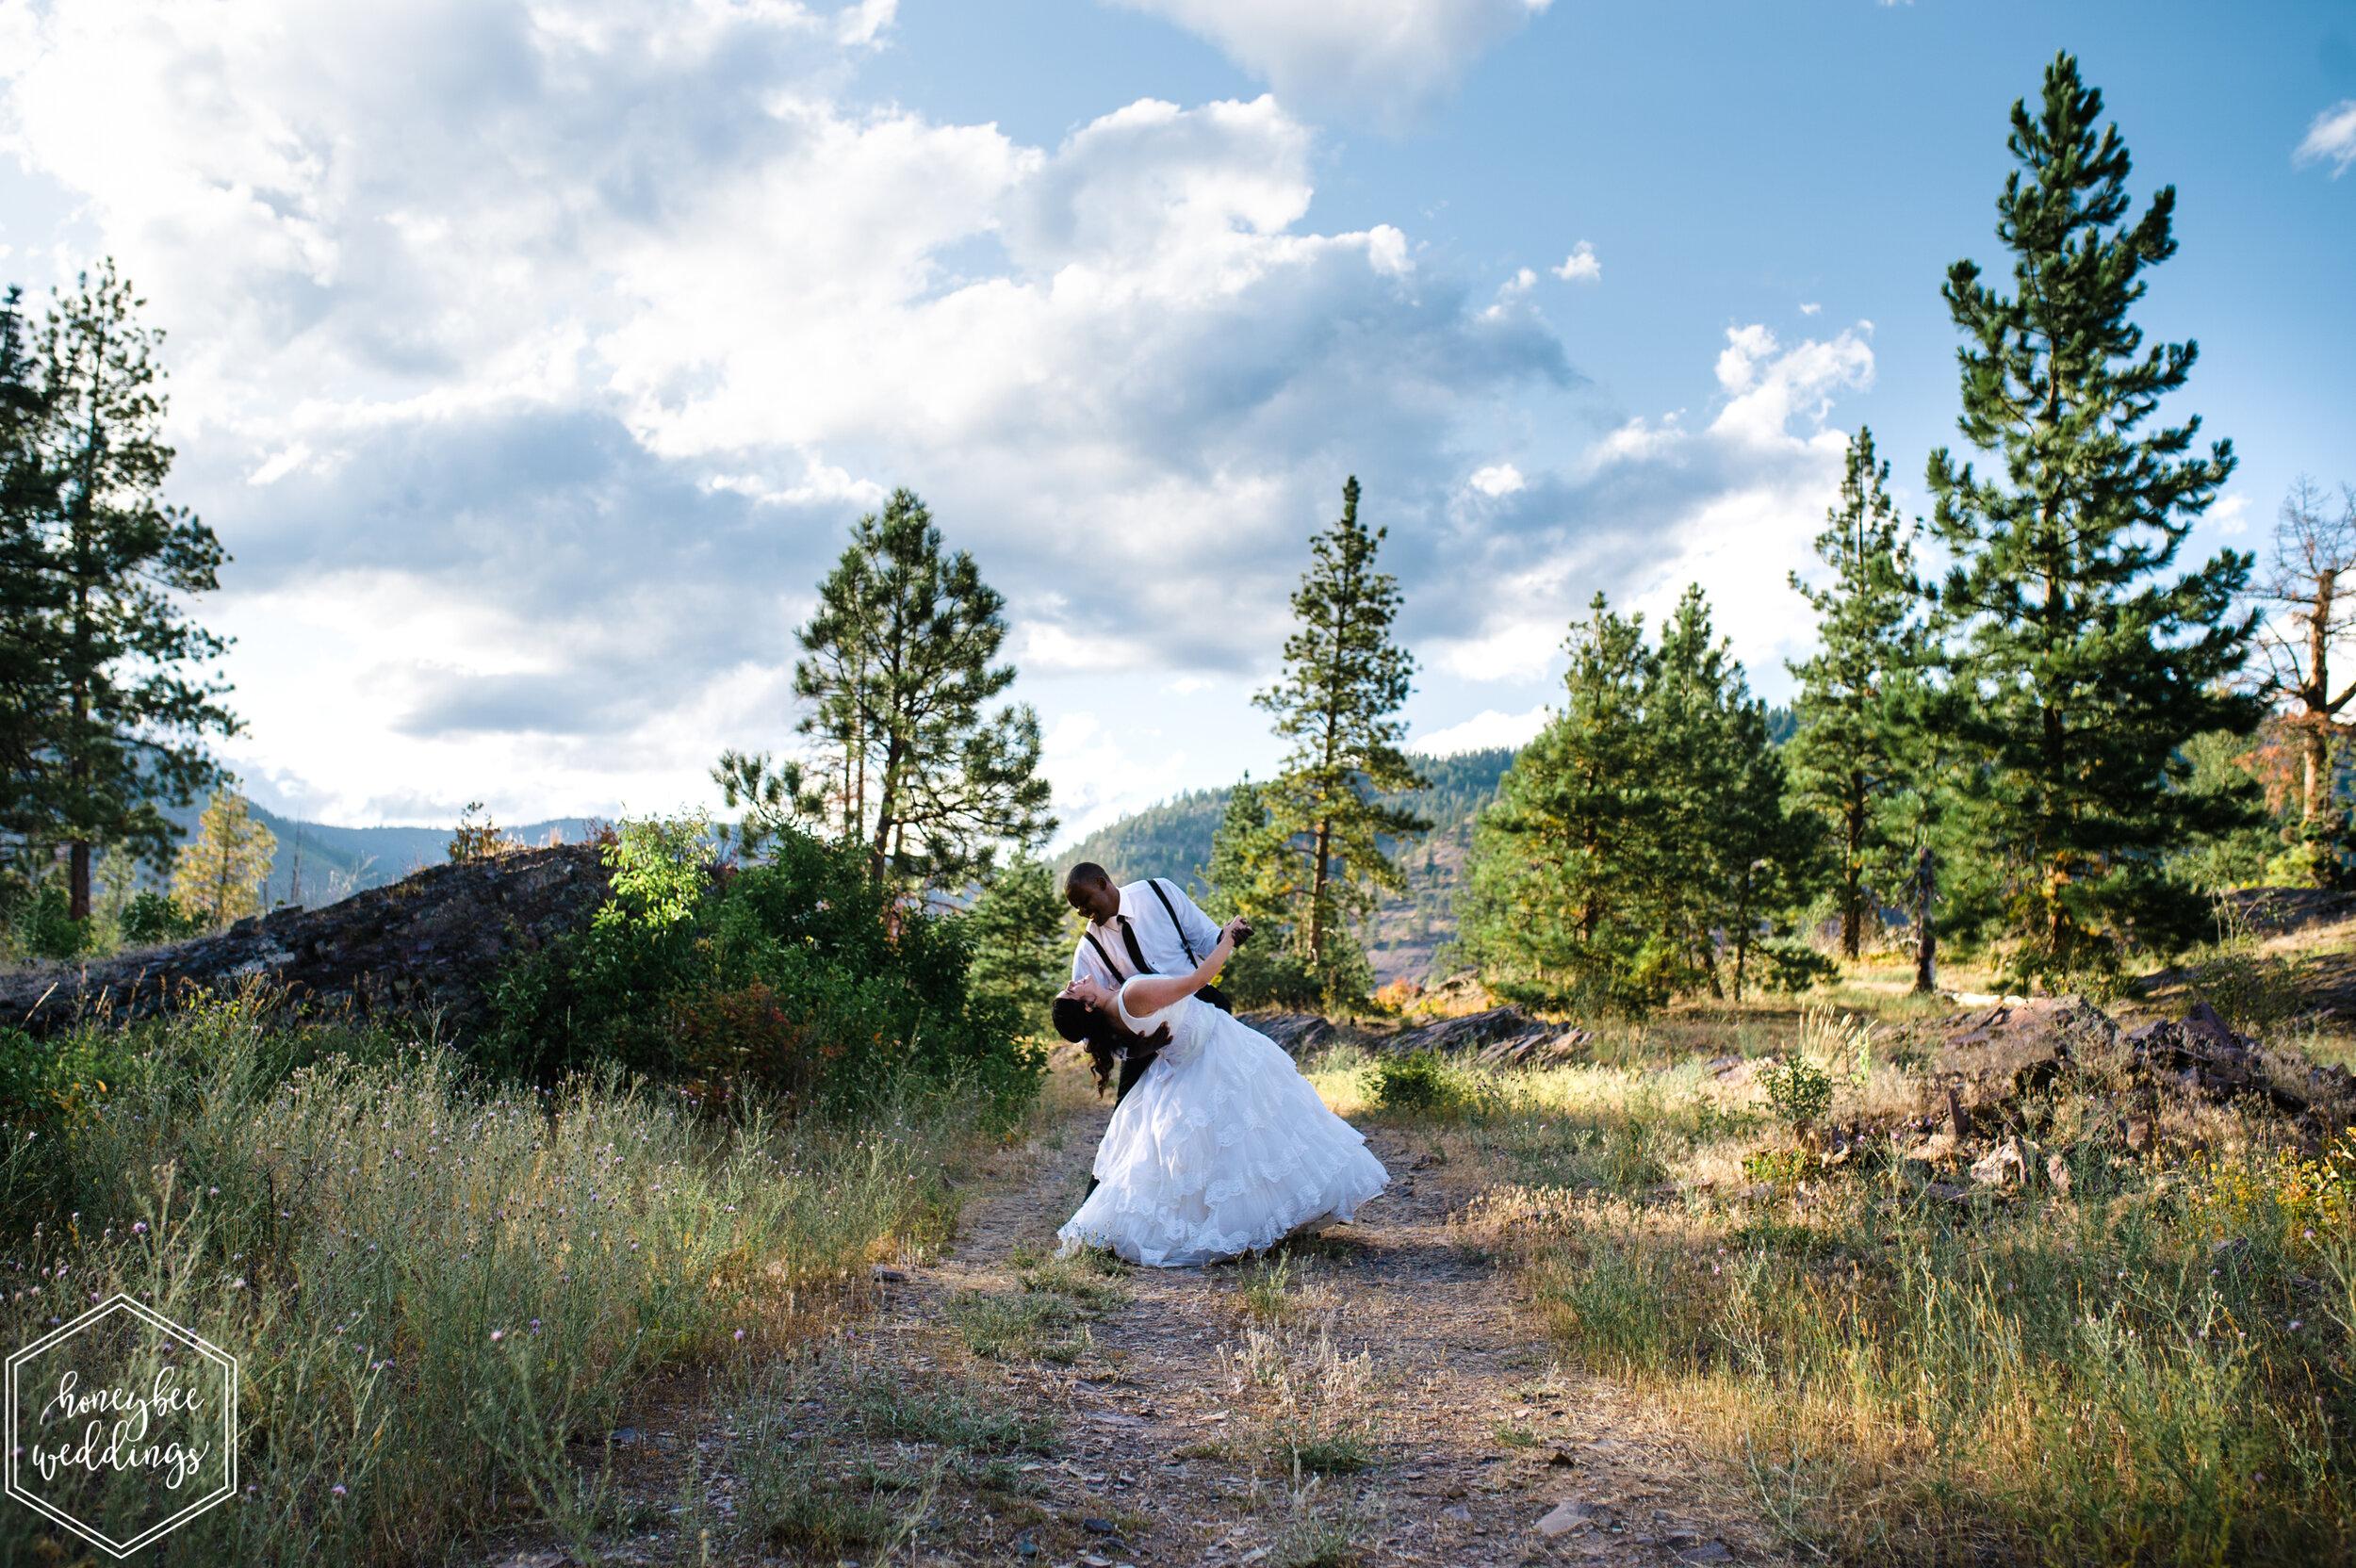 013White Raven Wedding_Montana Wedding Photographer_Rebekah & Likom_July 27, 2019-8.jpg